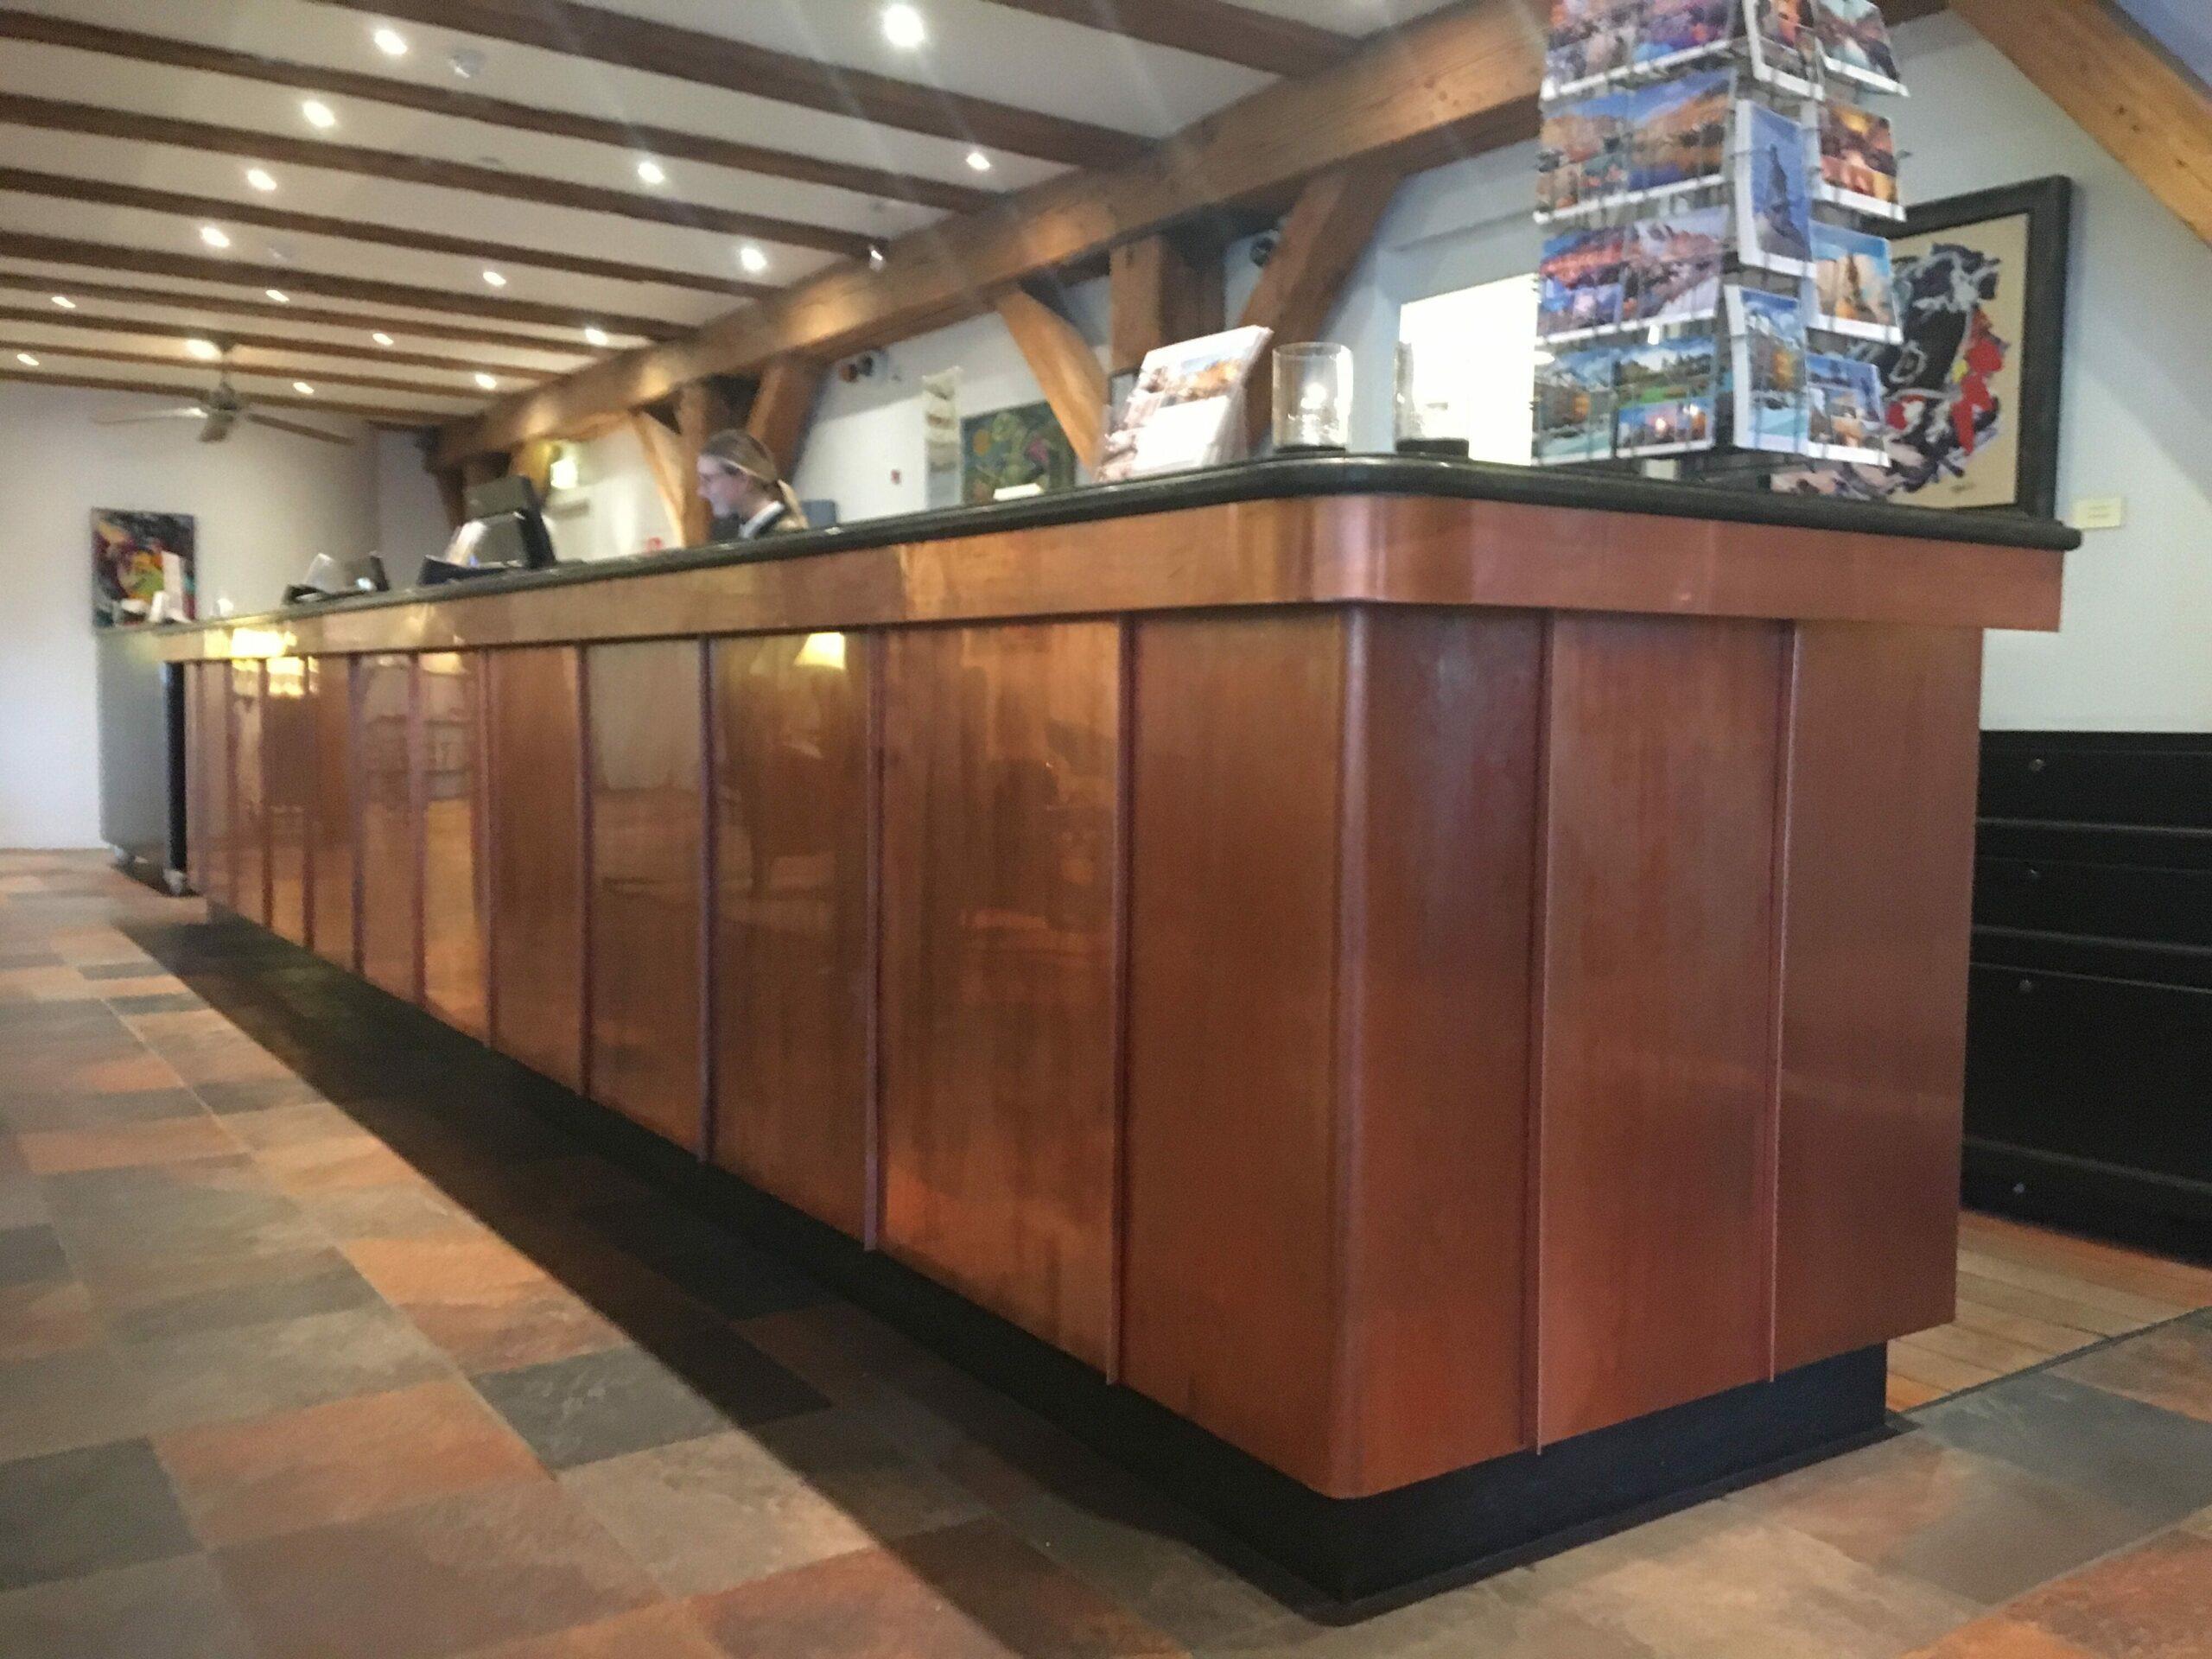 Reception desk tailor-made copper solution